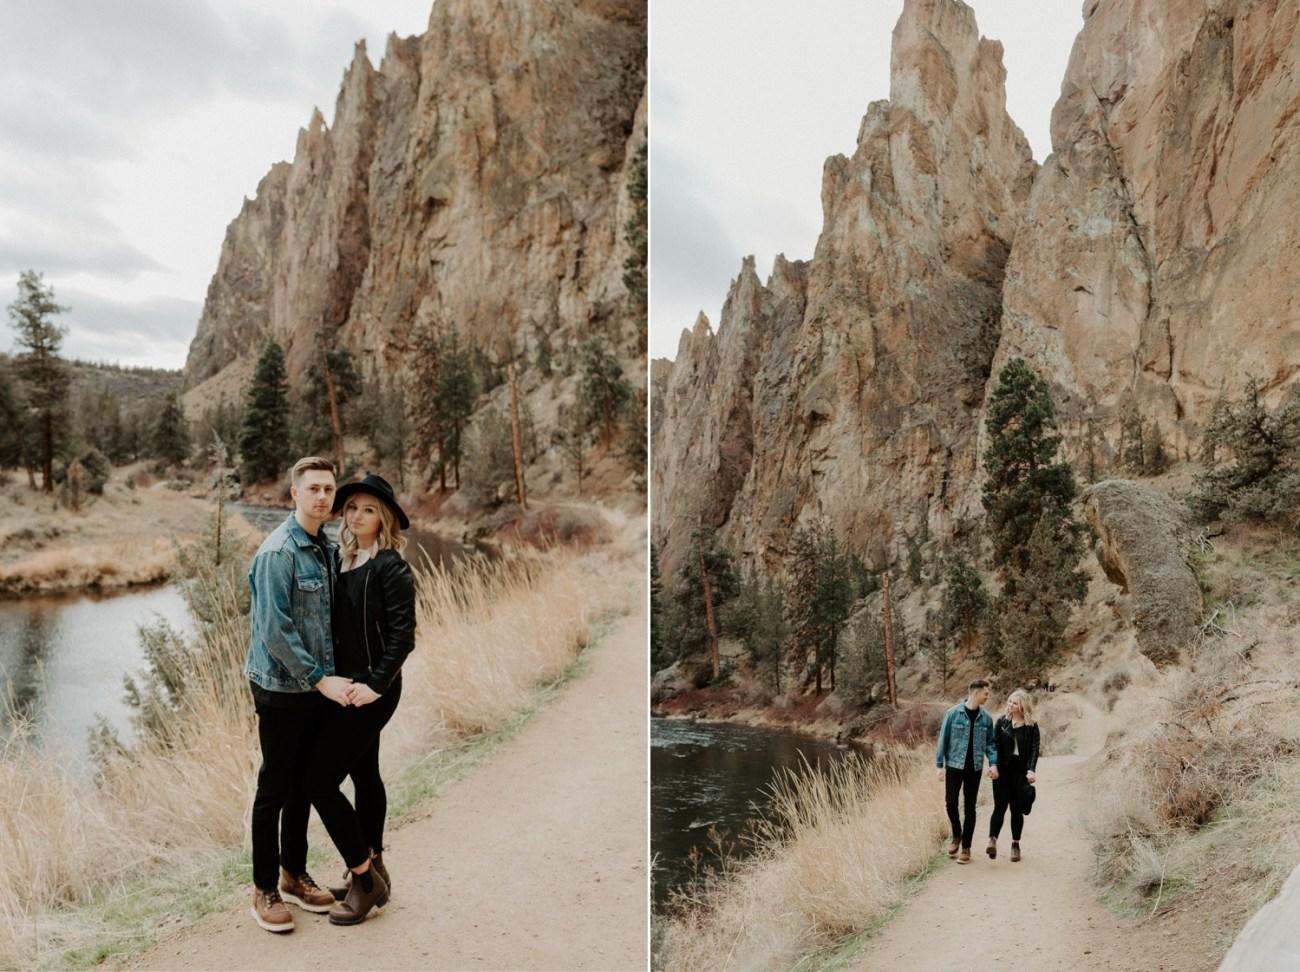 Smith Rock State Park Engagement Session Bend Oregon Wedding Photographer Anais Possamai Photography 016